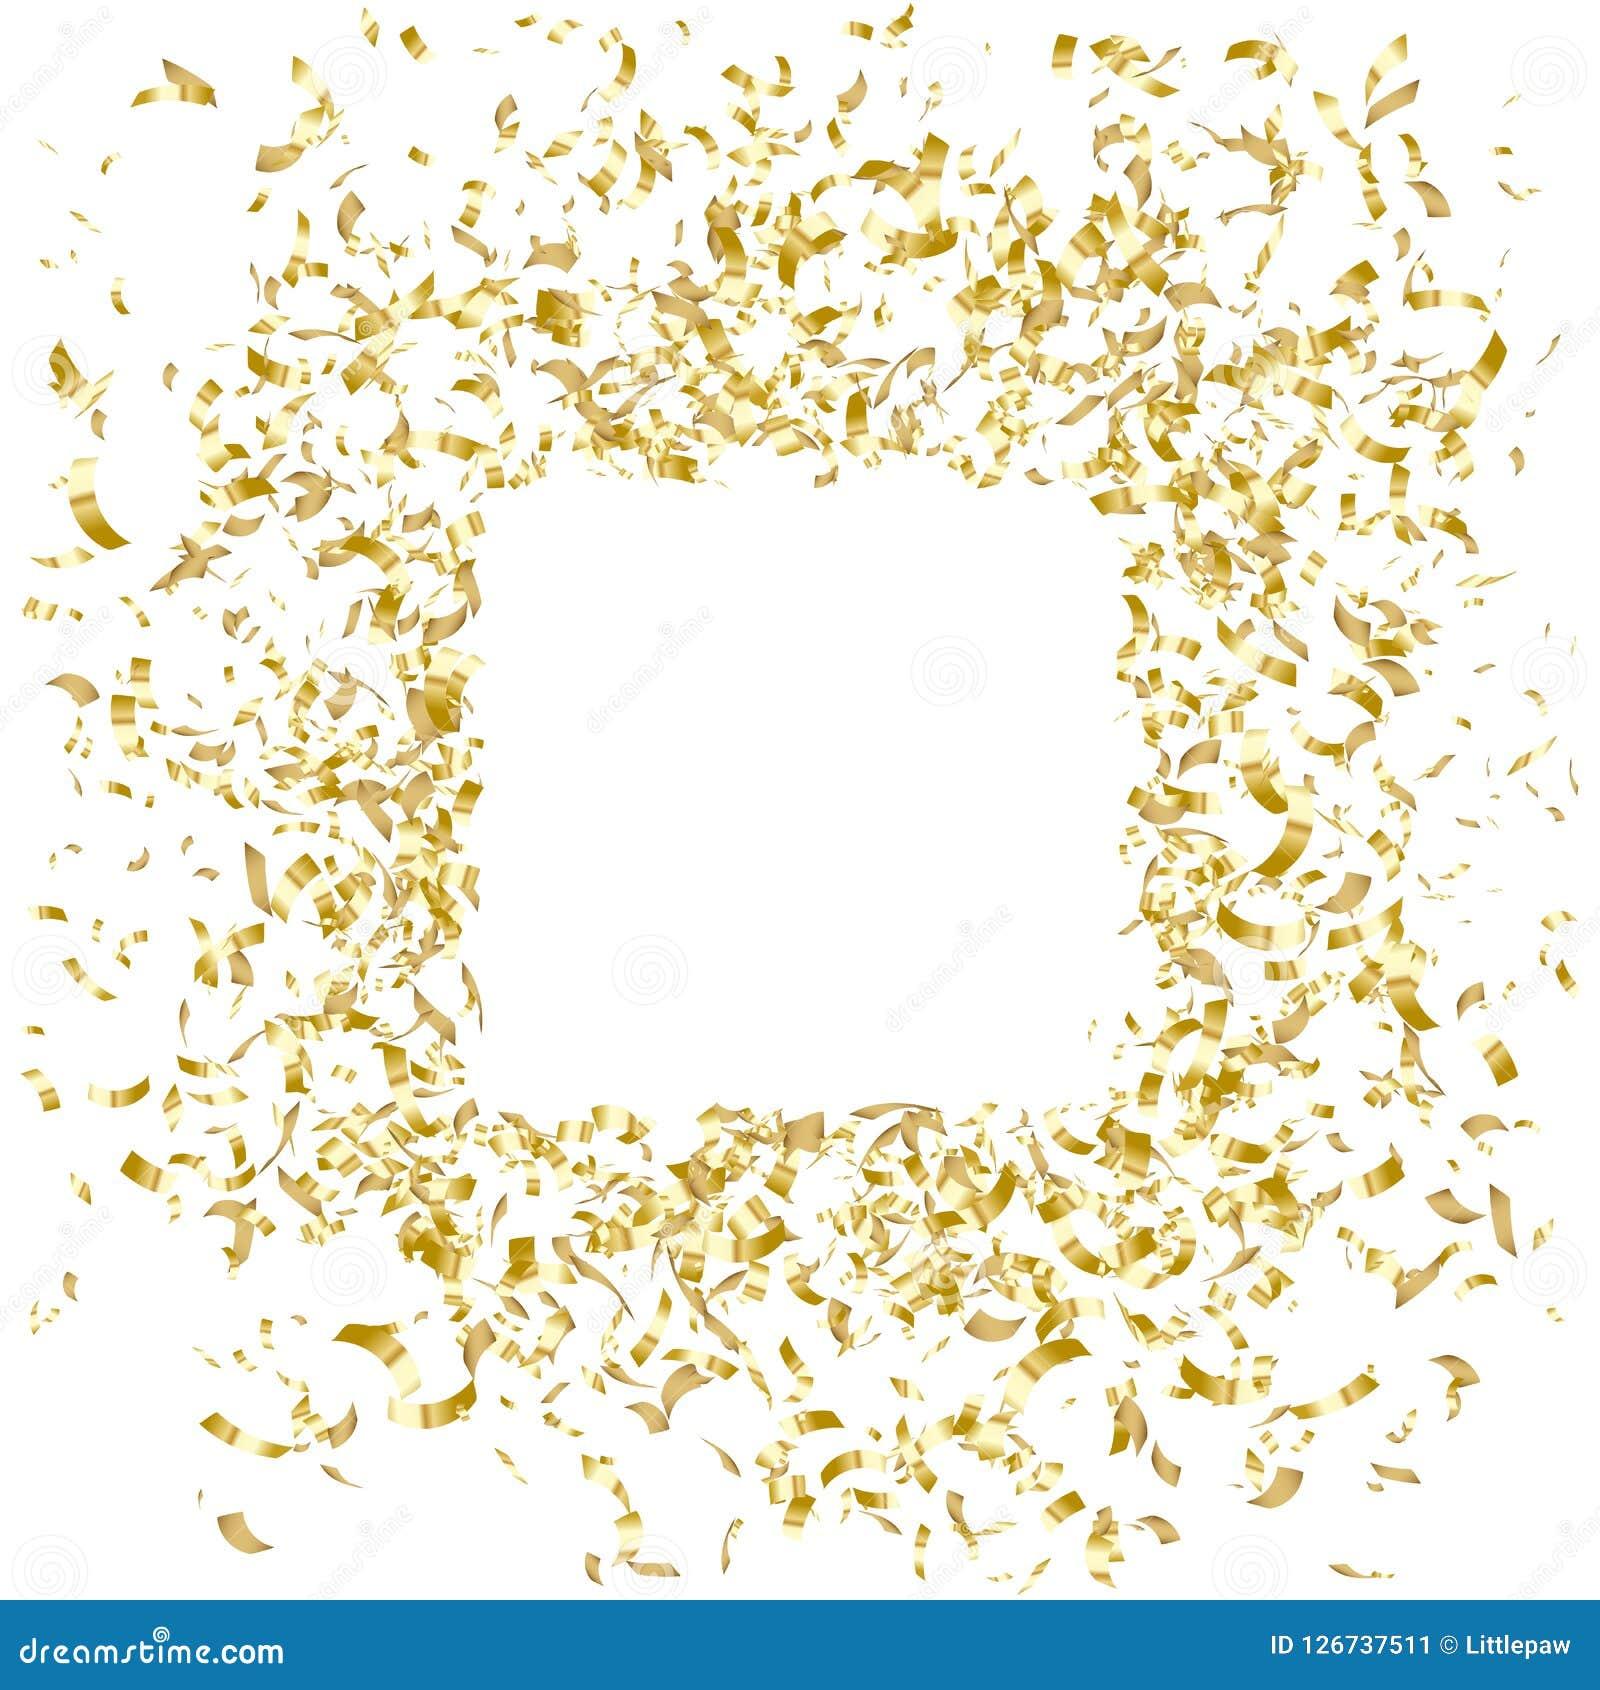 Gold confetti frame design, holiday banner, vector illustration